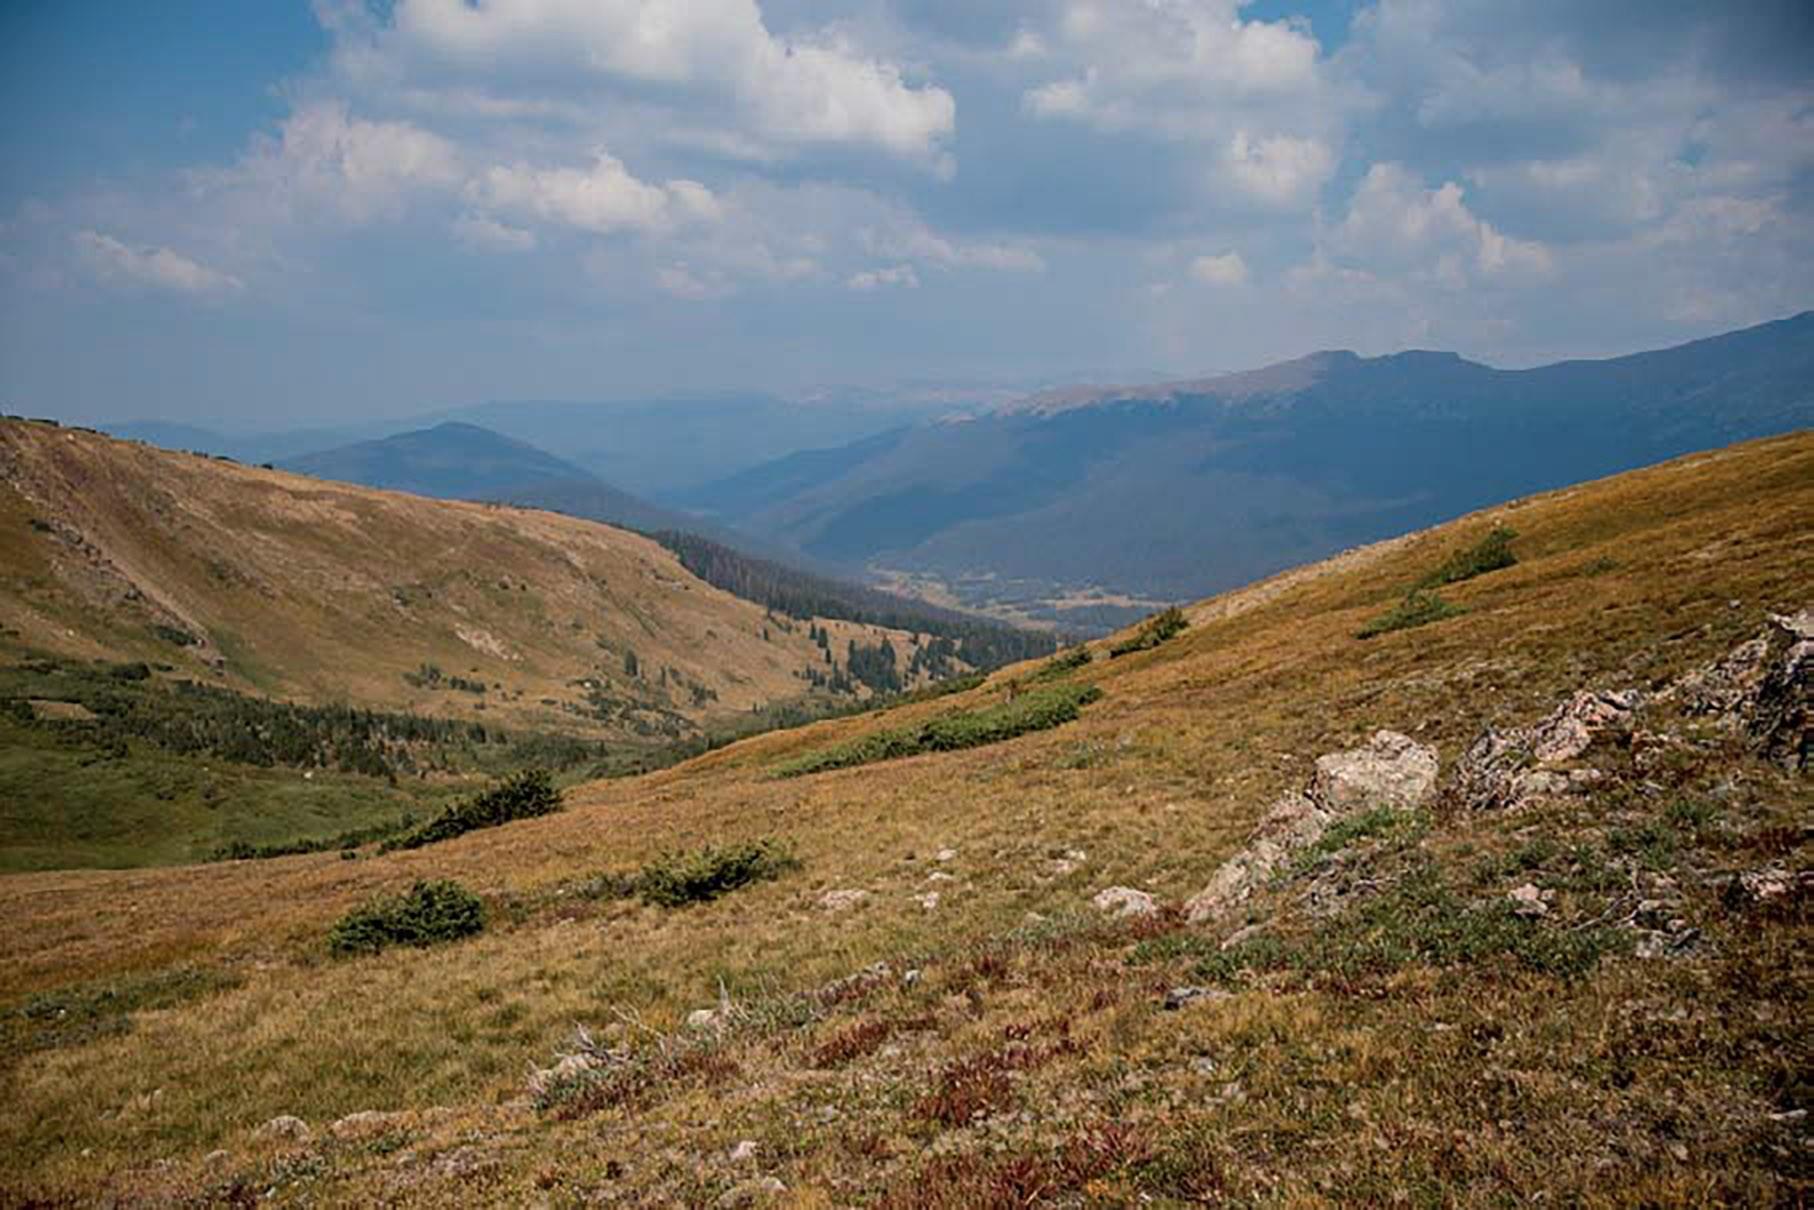 Alpine Ridge Trail, Rocky Mountain National Park, Colorado ISO 100; 1/1250 sec.; f/4.0; 17mm